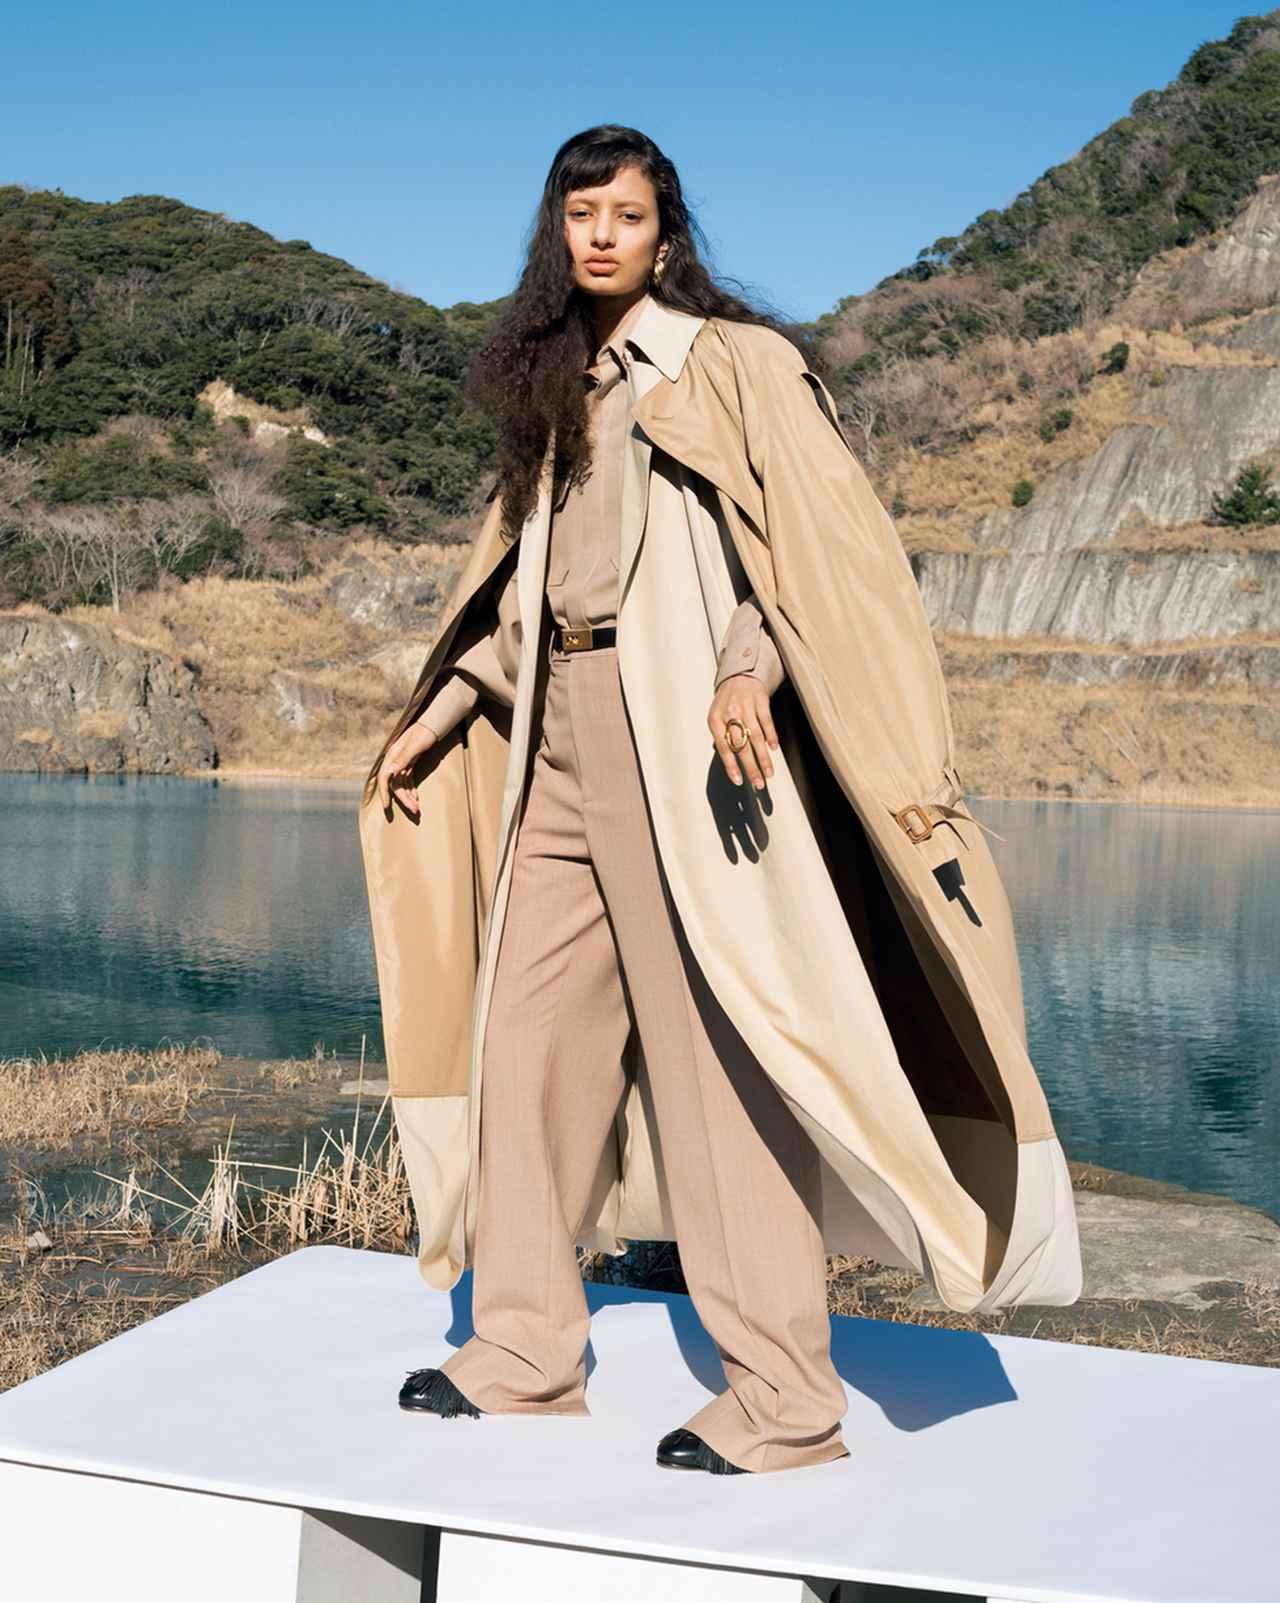 Images : 2番目の画像 - 「トレンチコートの多様性」のアルバム - T JAPAN:The New York Times Style Magazine 公式サイト